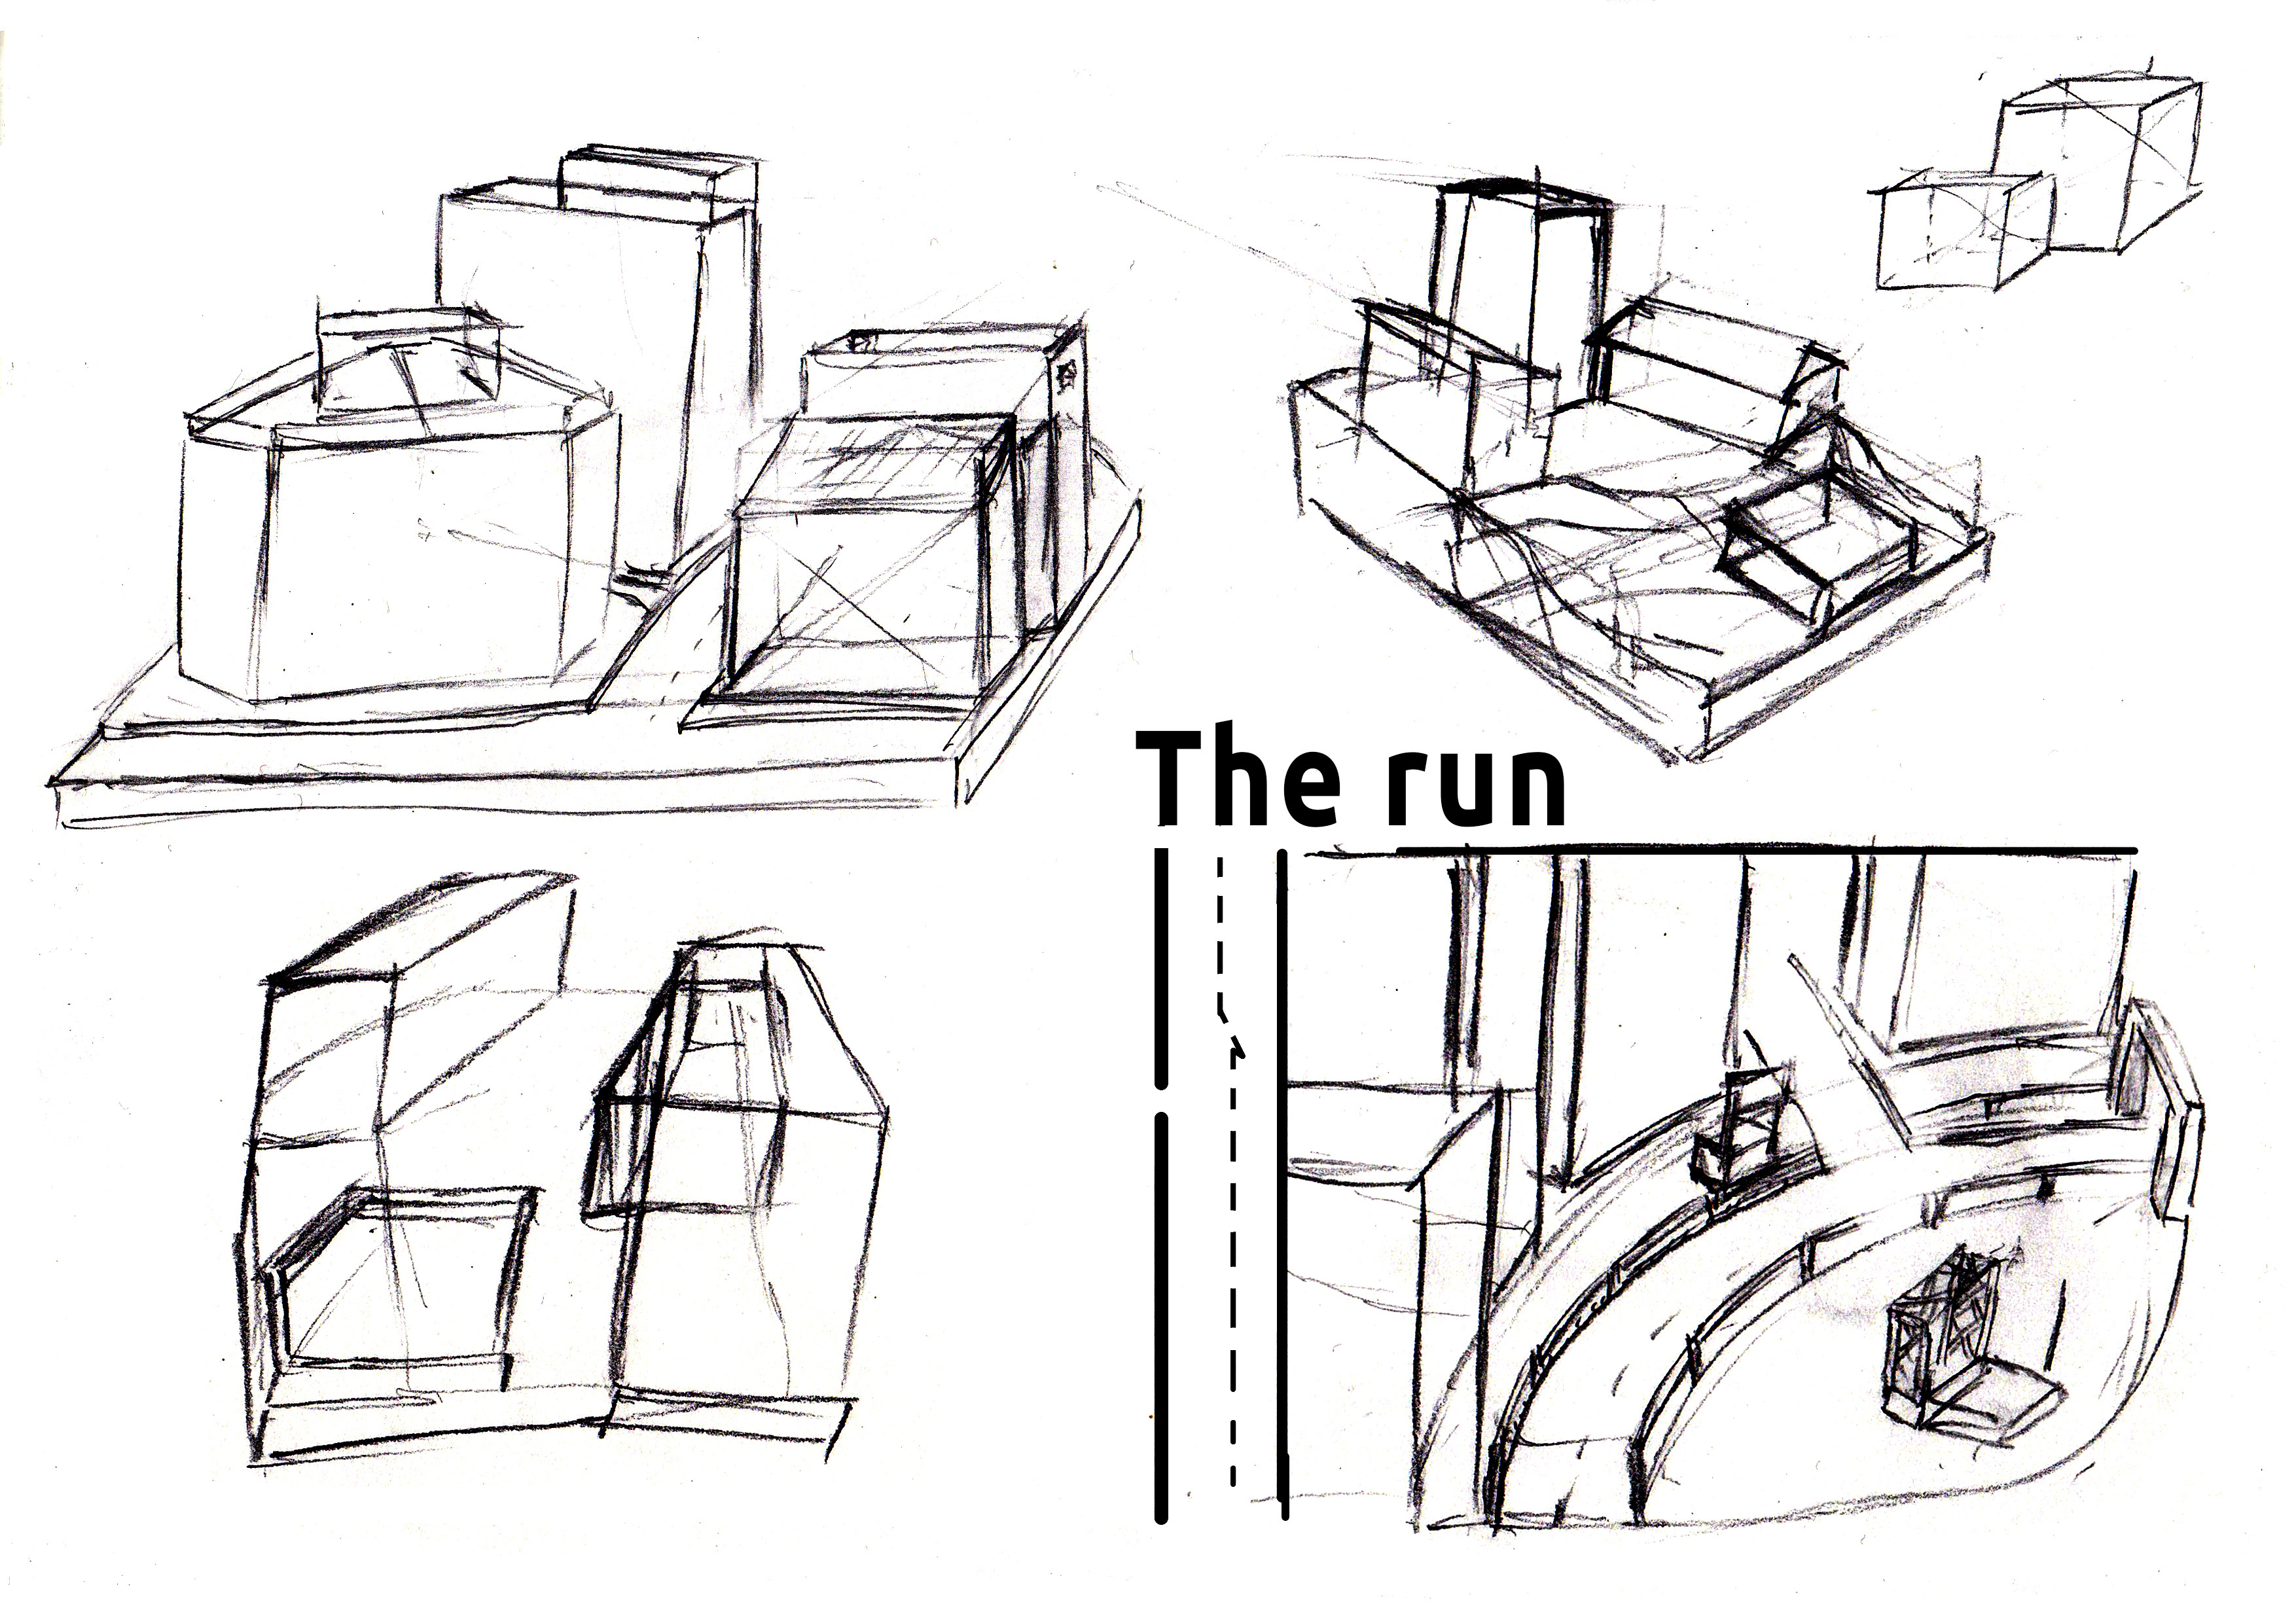 Idea - the run (more modern city)